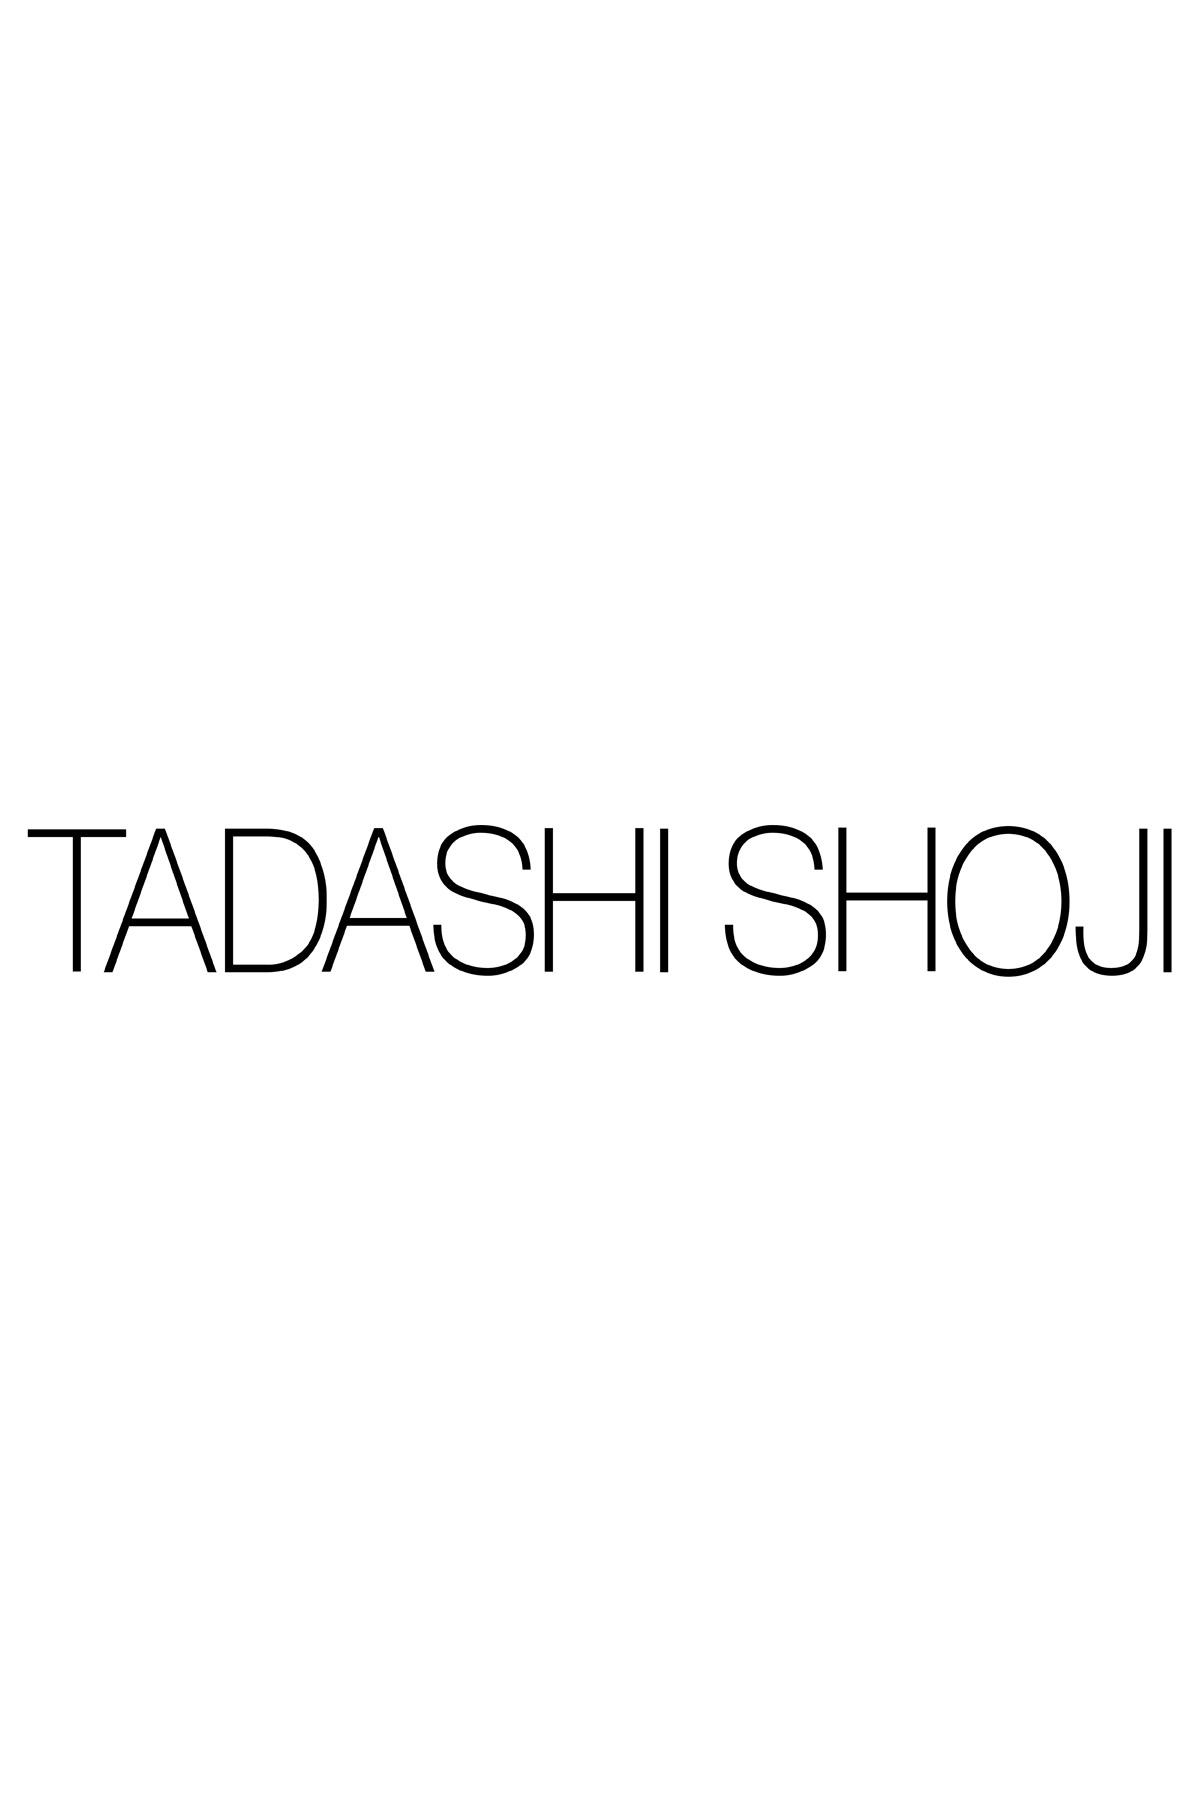 Tadashi Shoji x Bel Aire Bridal - Vintage - Inspired Rhinestone Swirl Comb